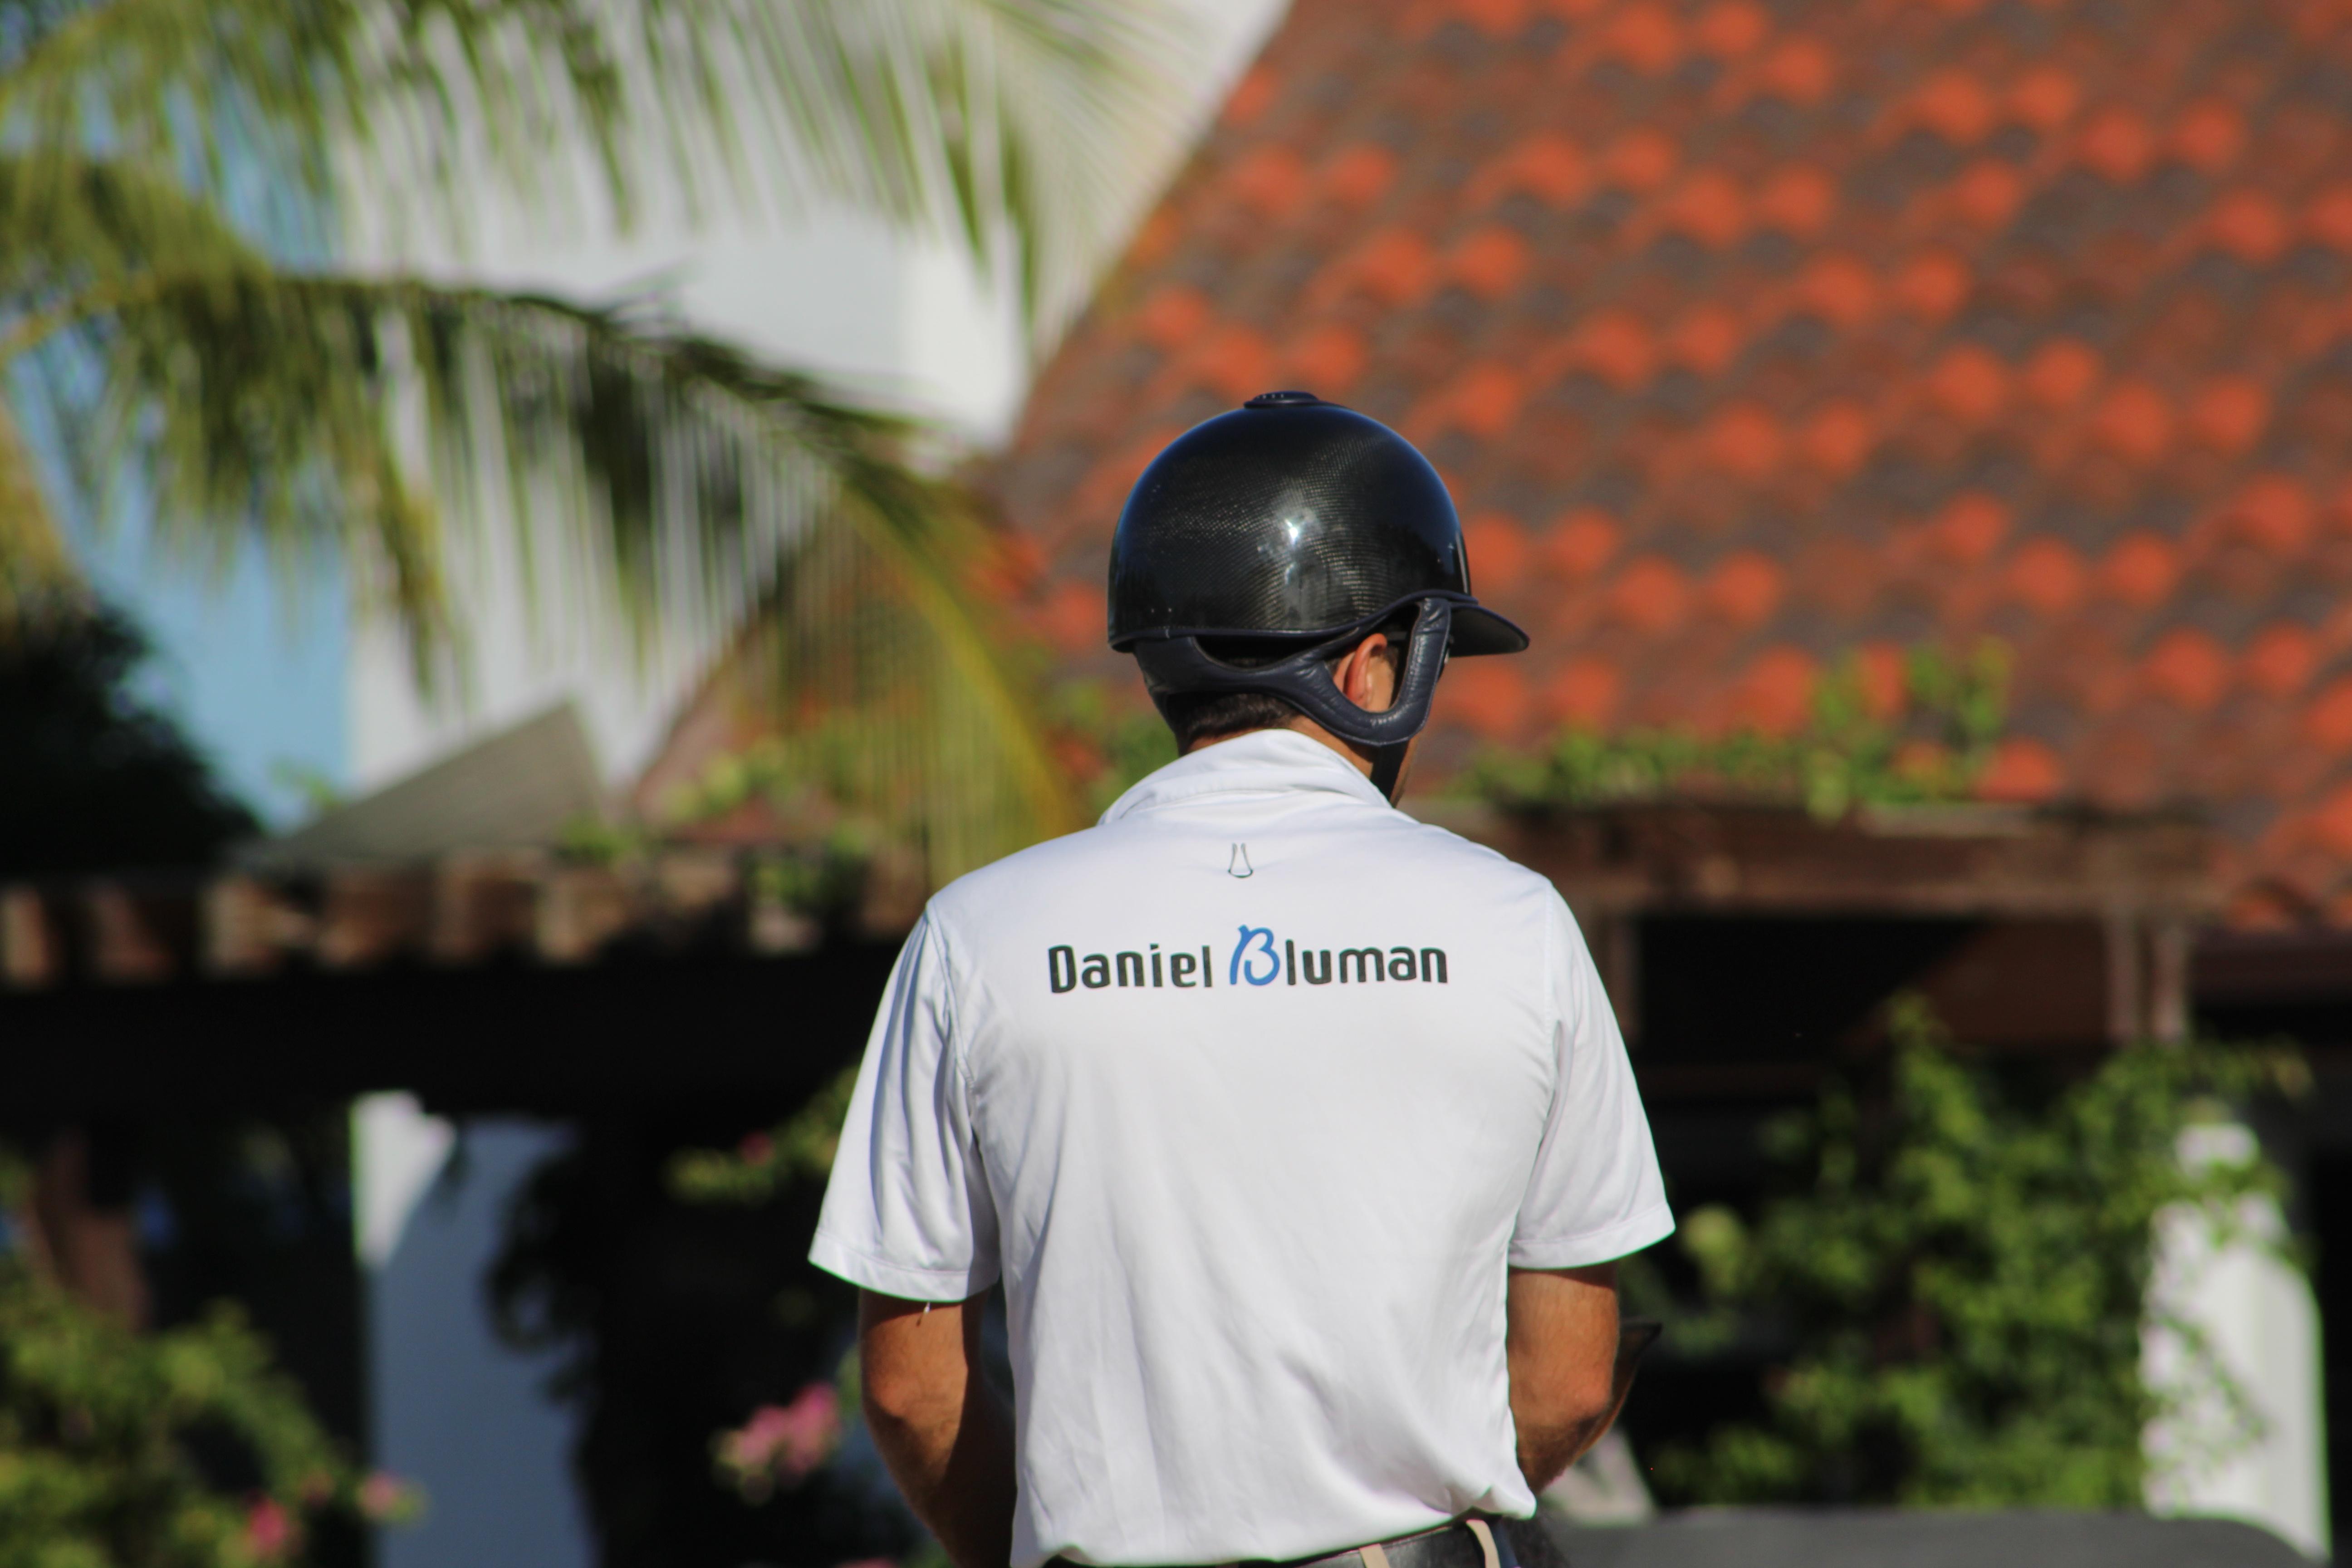 Daniel Bluman